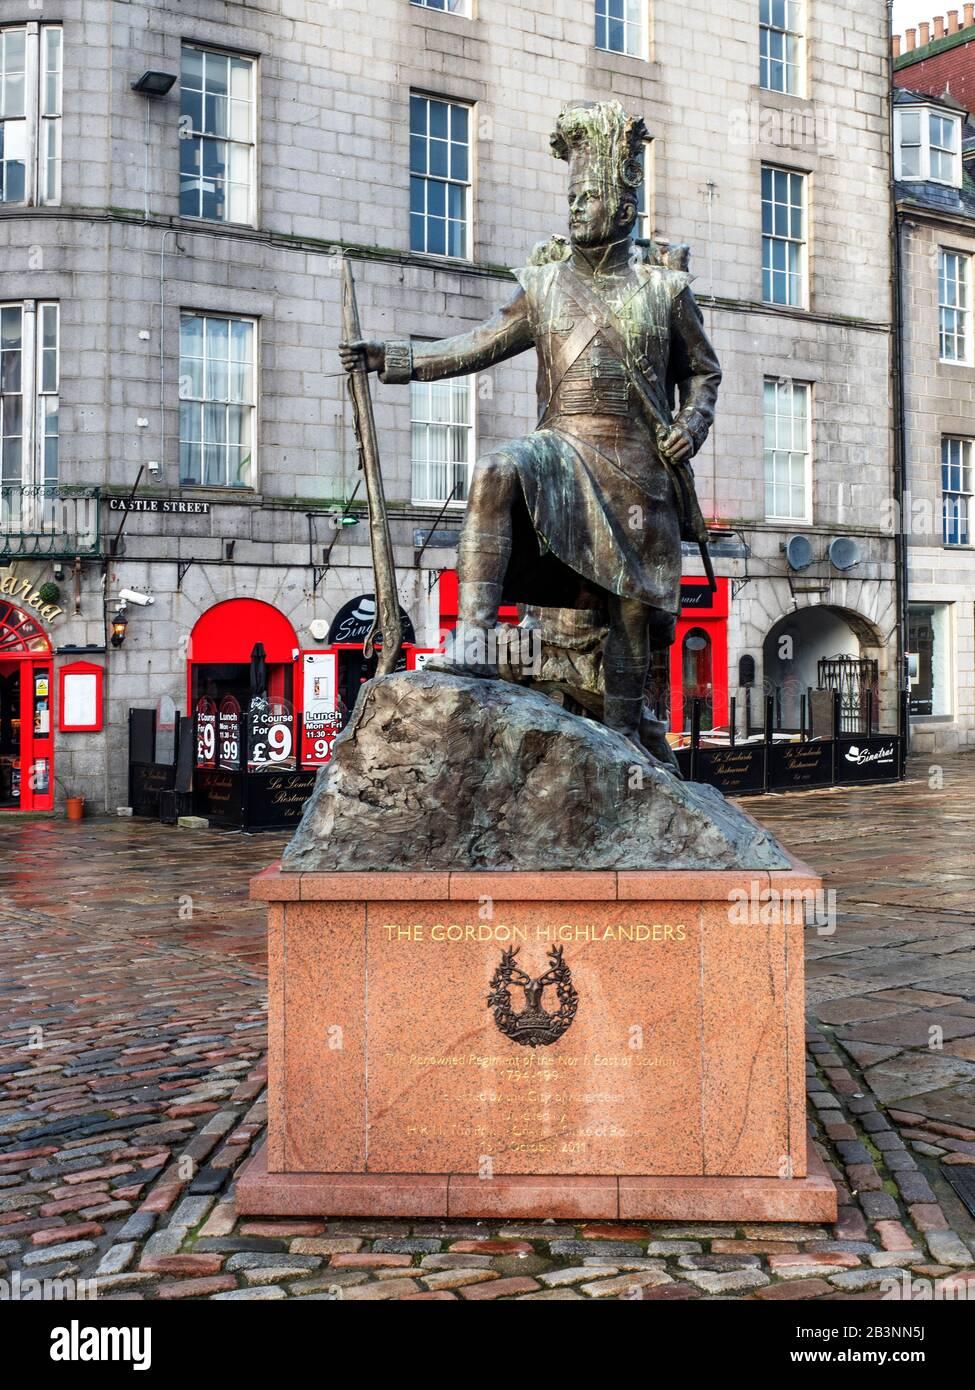 The Gordon Highlanders Statue by sculptor Mark Richards on Castle Street in Aberdeen Scotland Stock Photo